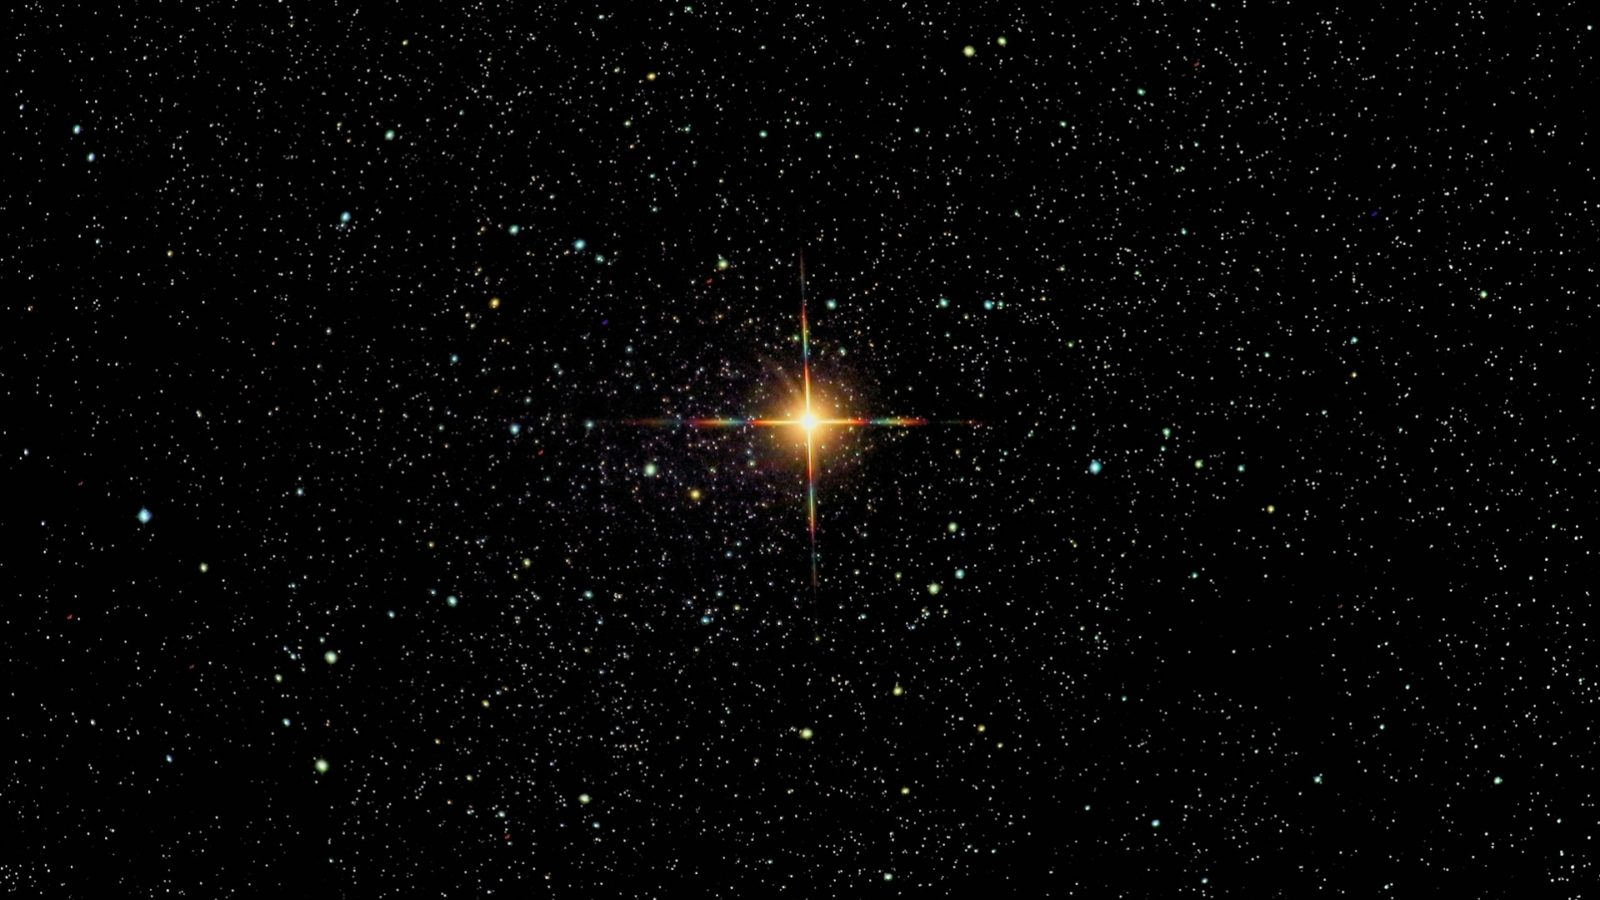 Звезда Процион